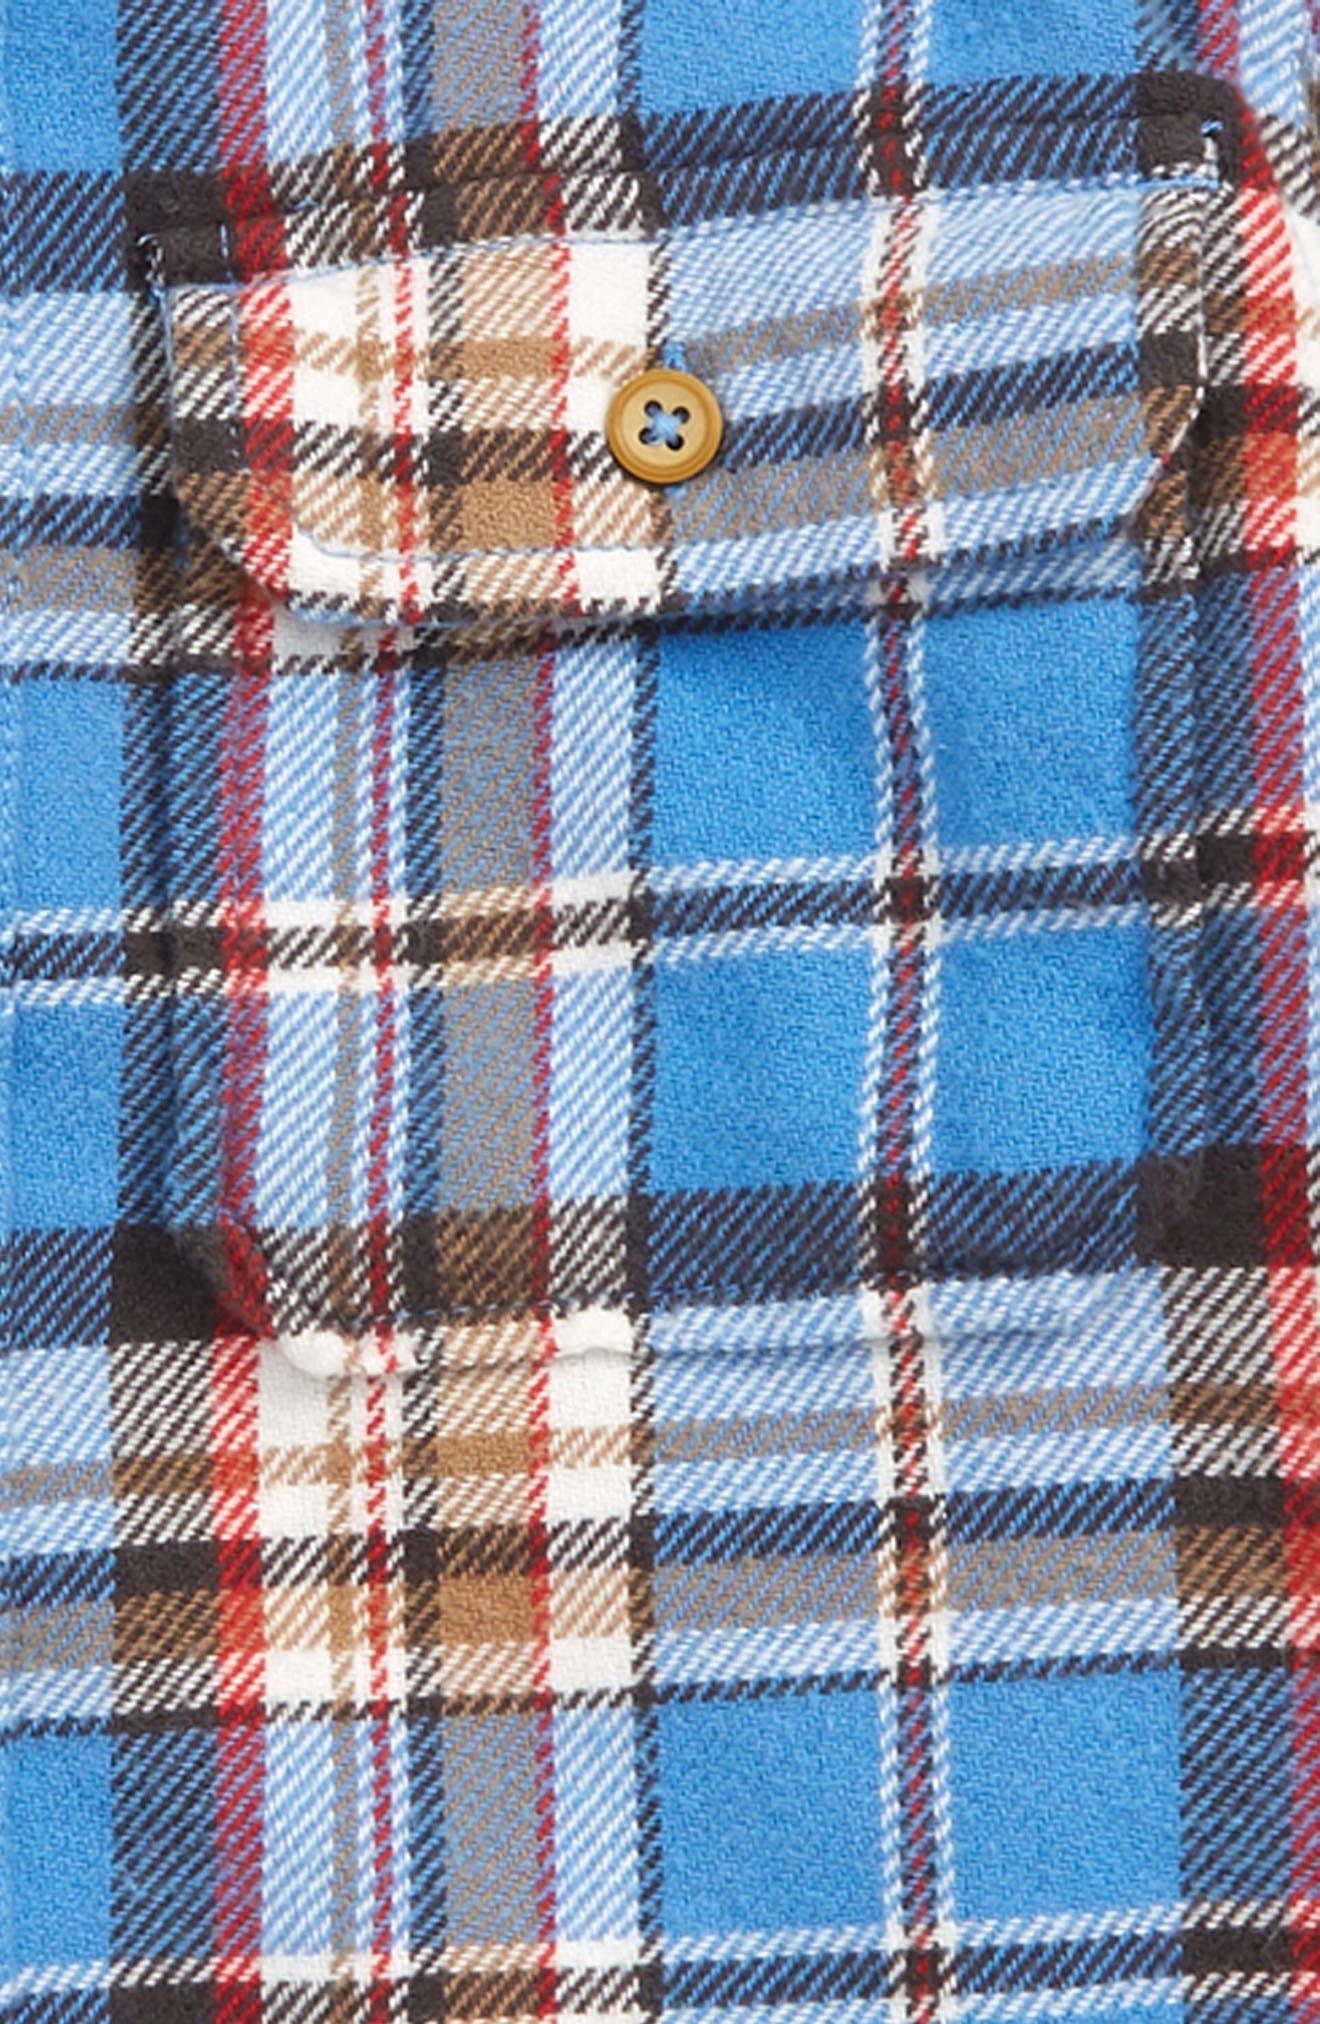 TUCKER + TATE, Plaid Flannel Shirt, Alternate thumbnail 2, color, BLUE LAPIS BILLY PLAID